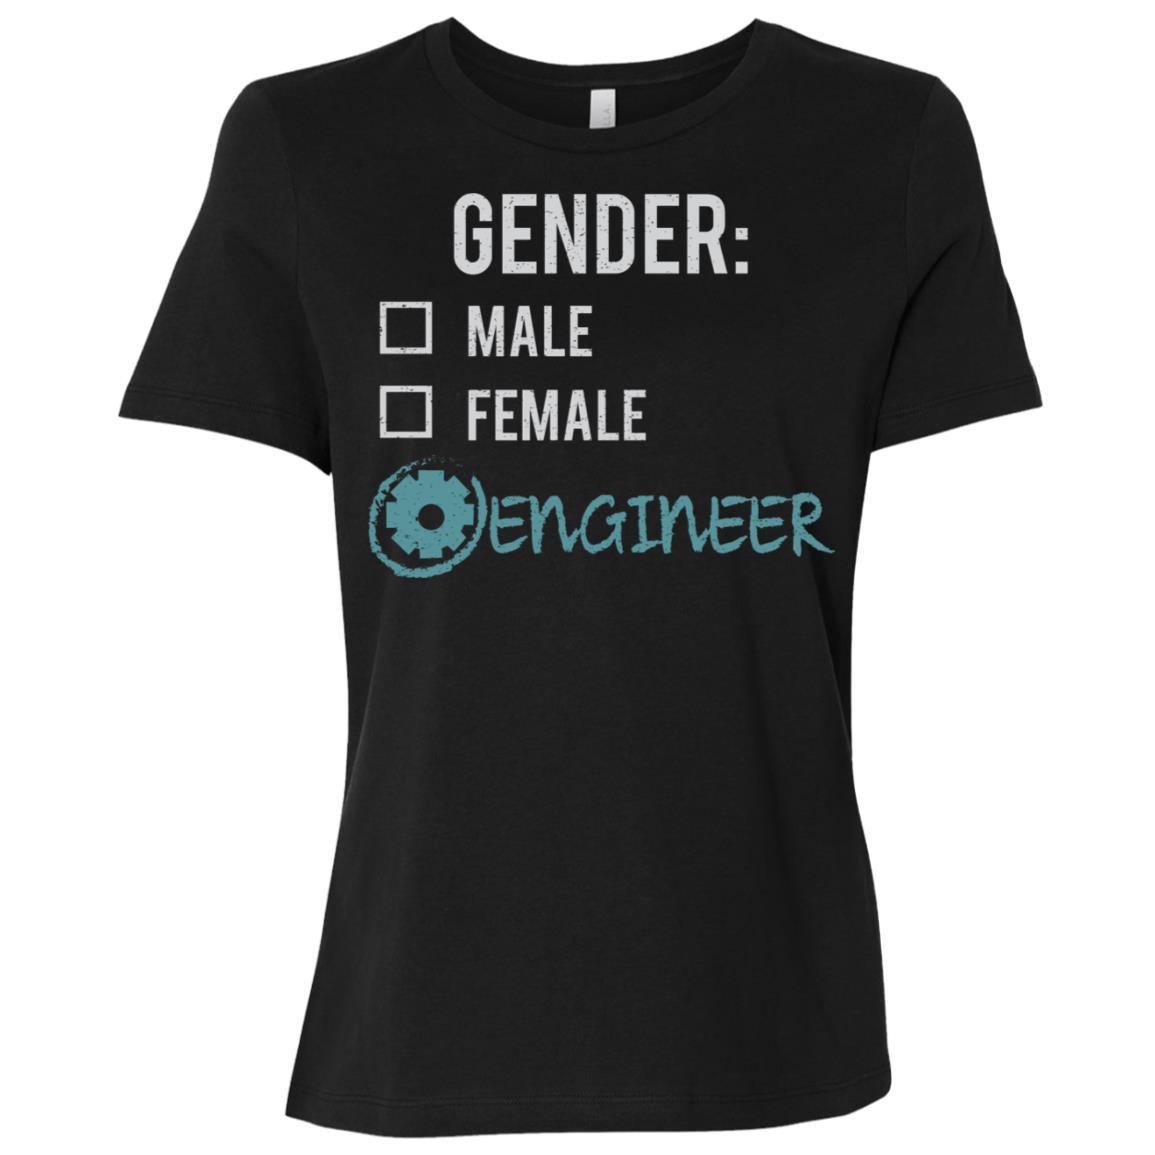 Male Female Engineer Gender Nonbinary Trans Women Short Sleeve T-Shirt